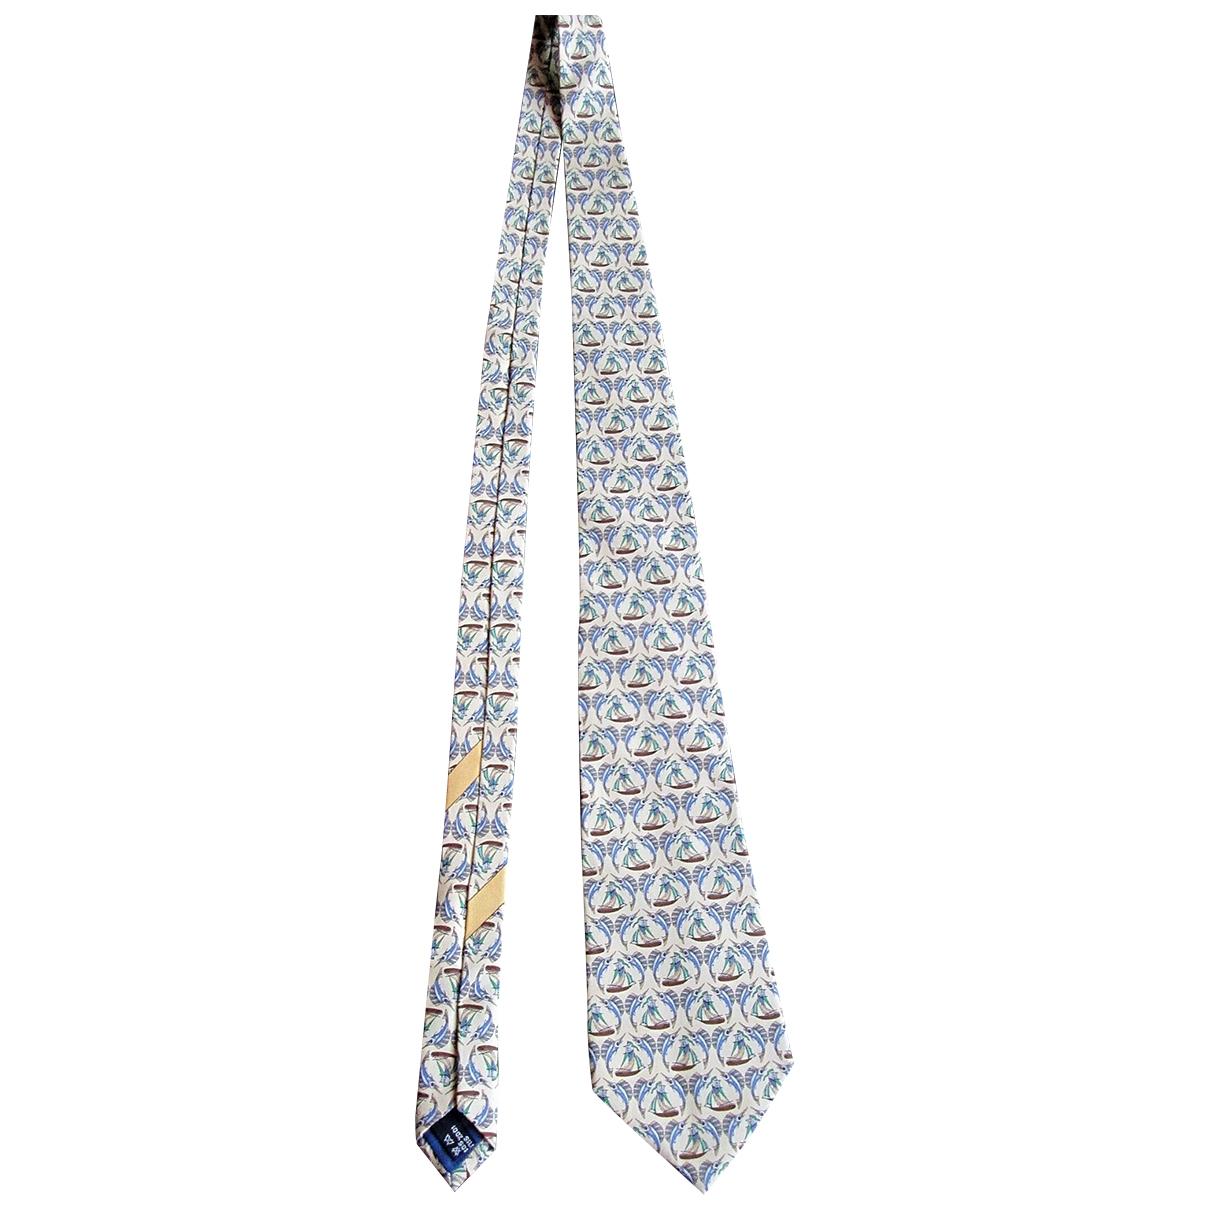 Salvatore Ferragamo - Cravates   pour homme en soie - jaune